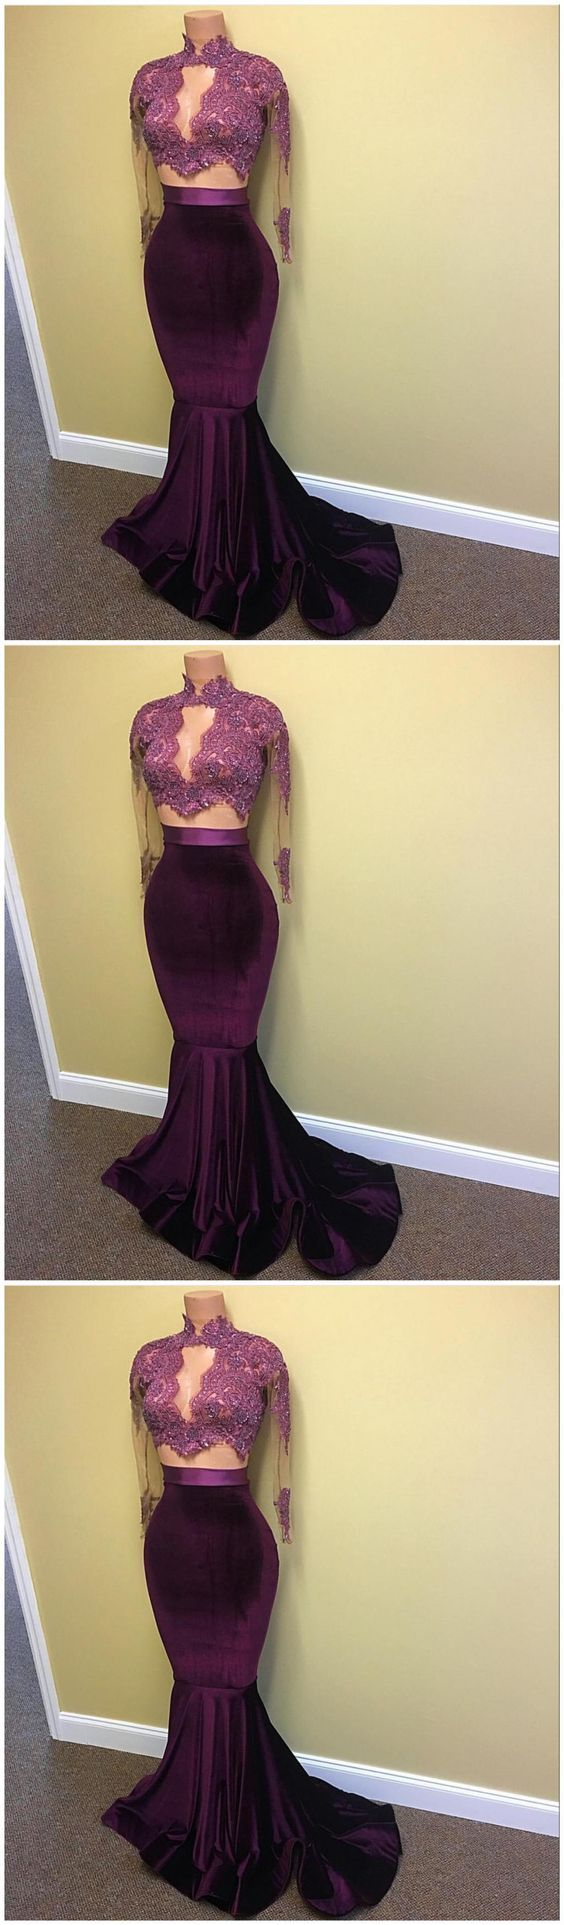 Elegant prom dresslong sleeve evening dressformal gown from